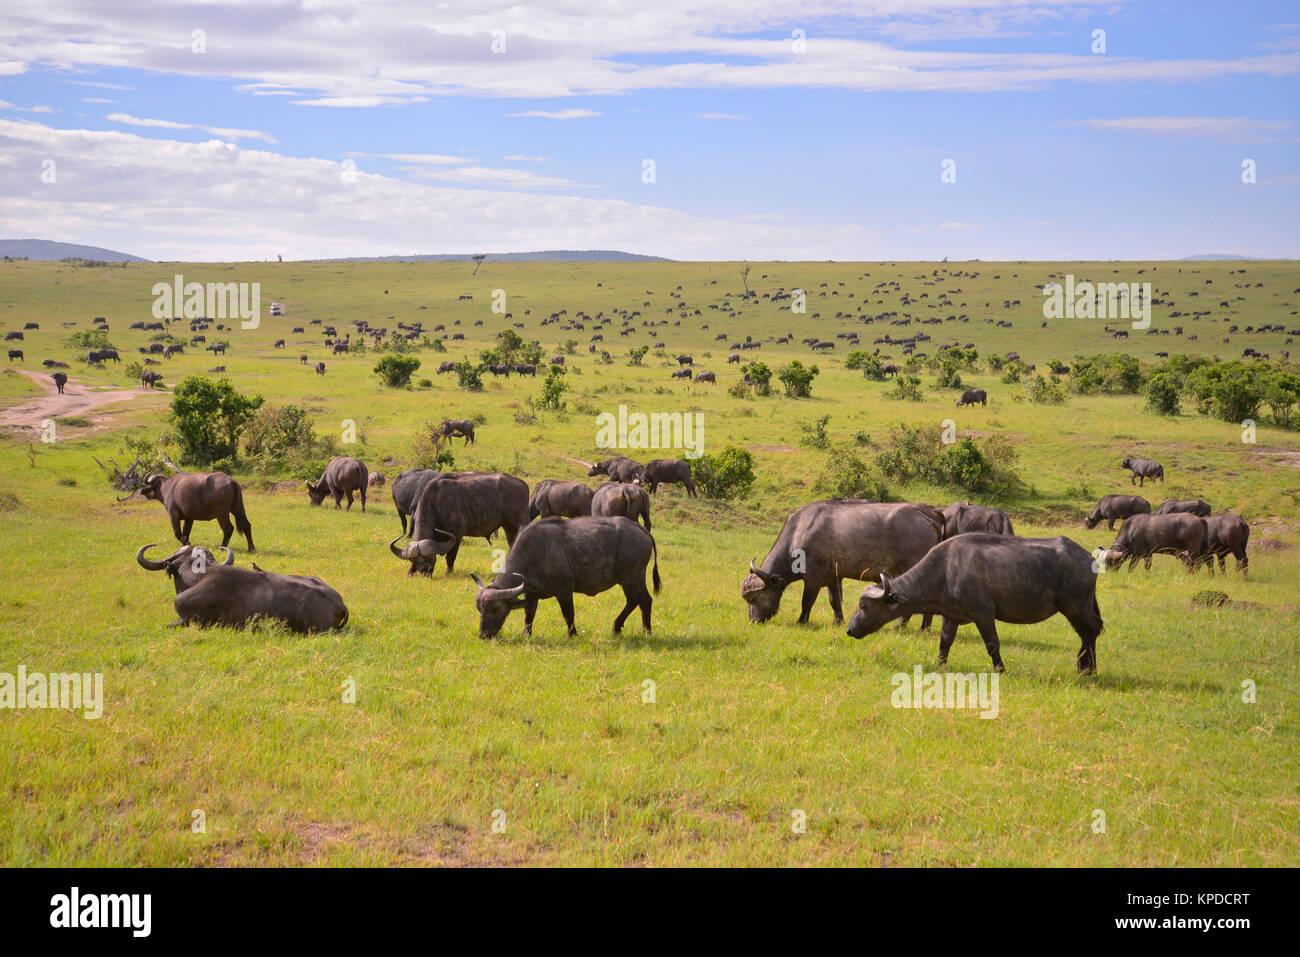 Wildlife in Maasai Mara, Kenya. Cape buffalo herd on green grass. - Stock Image